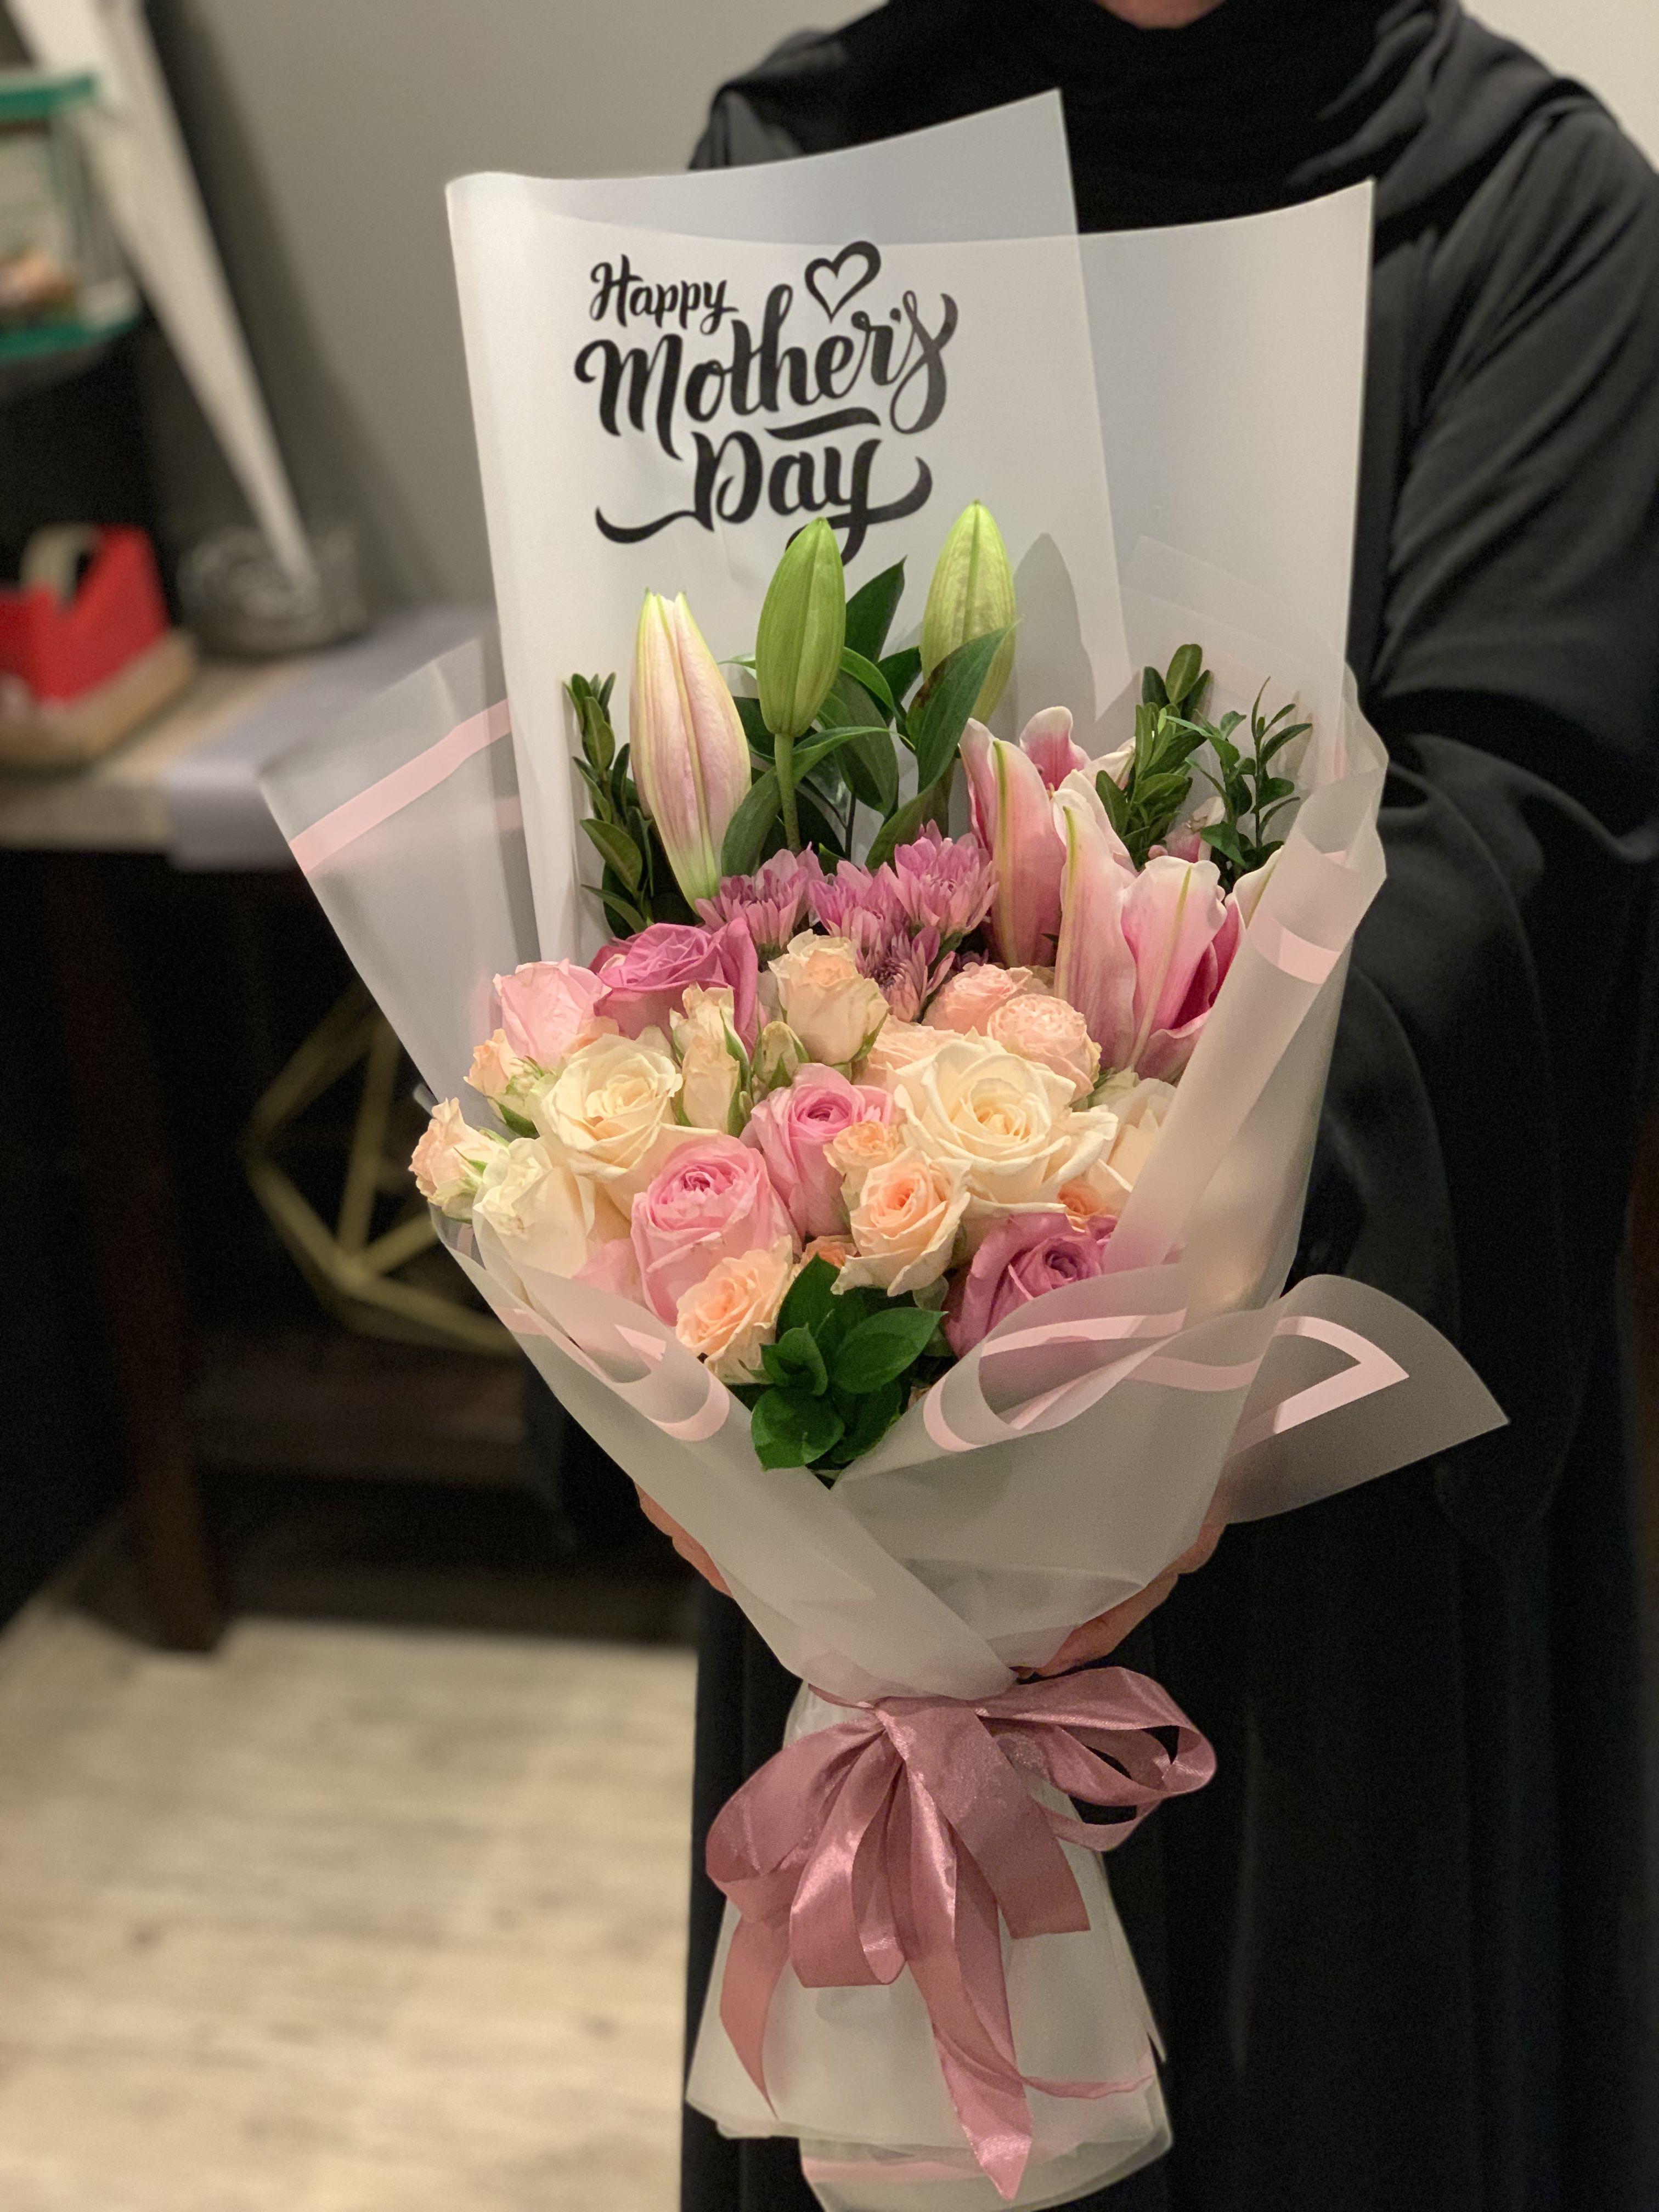 Pin By Fiori Bahrain On ورد Flowers Bouquet Bouquet Flowers